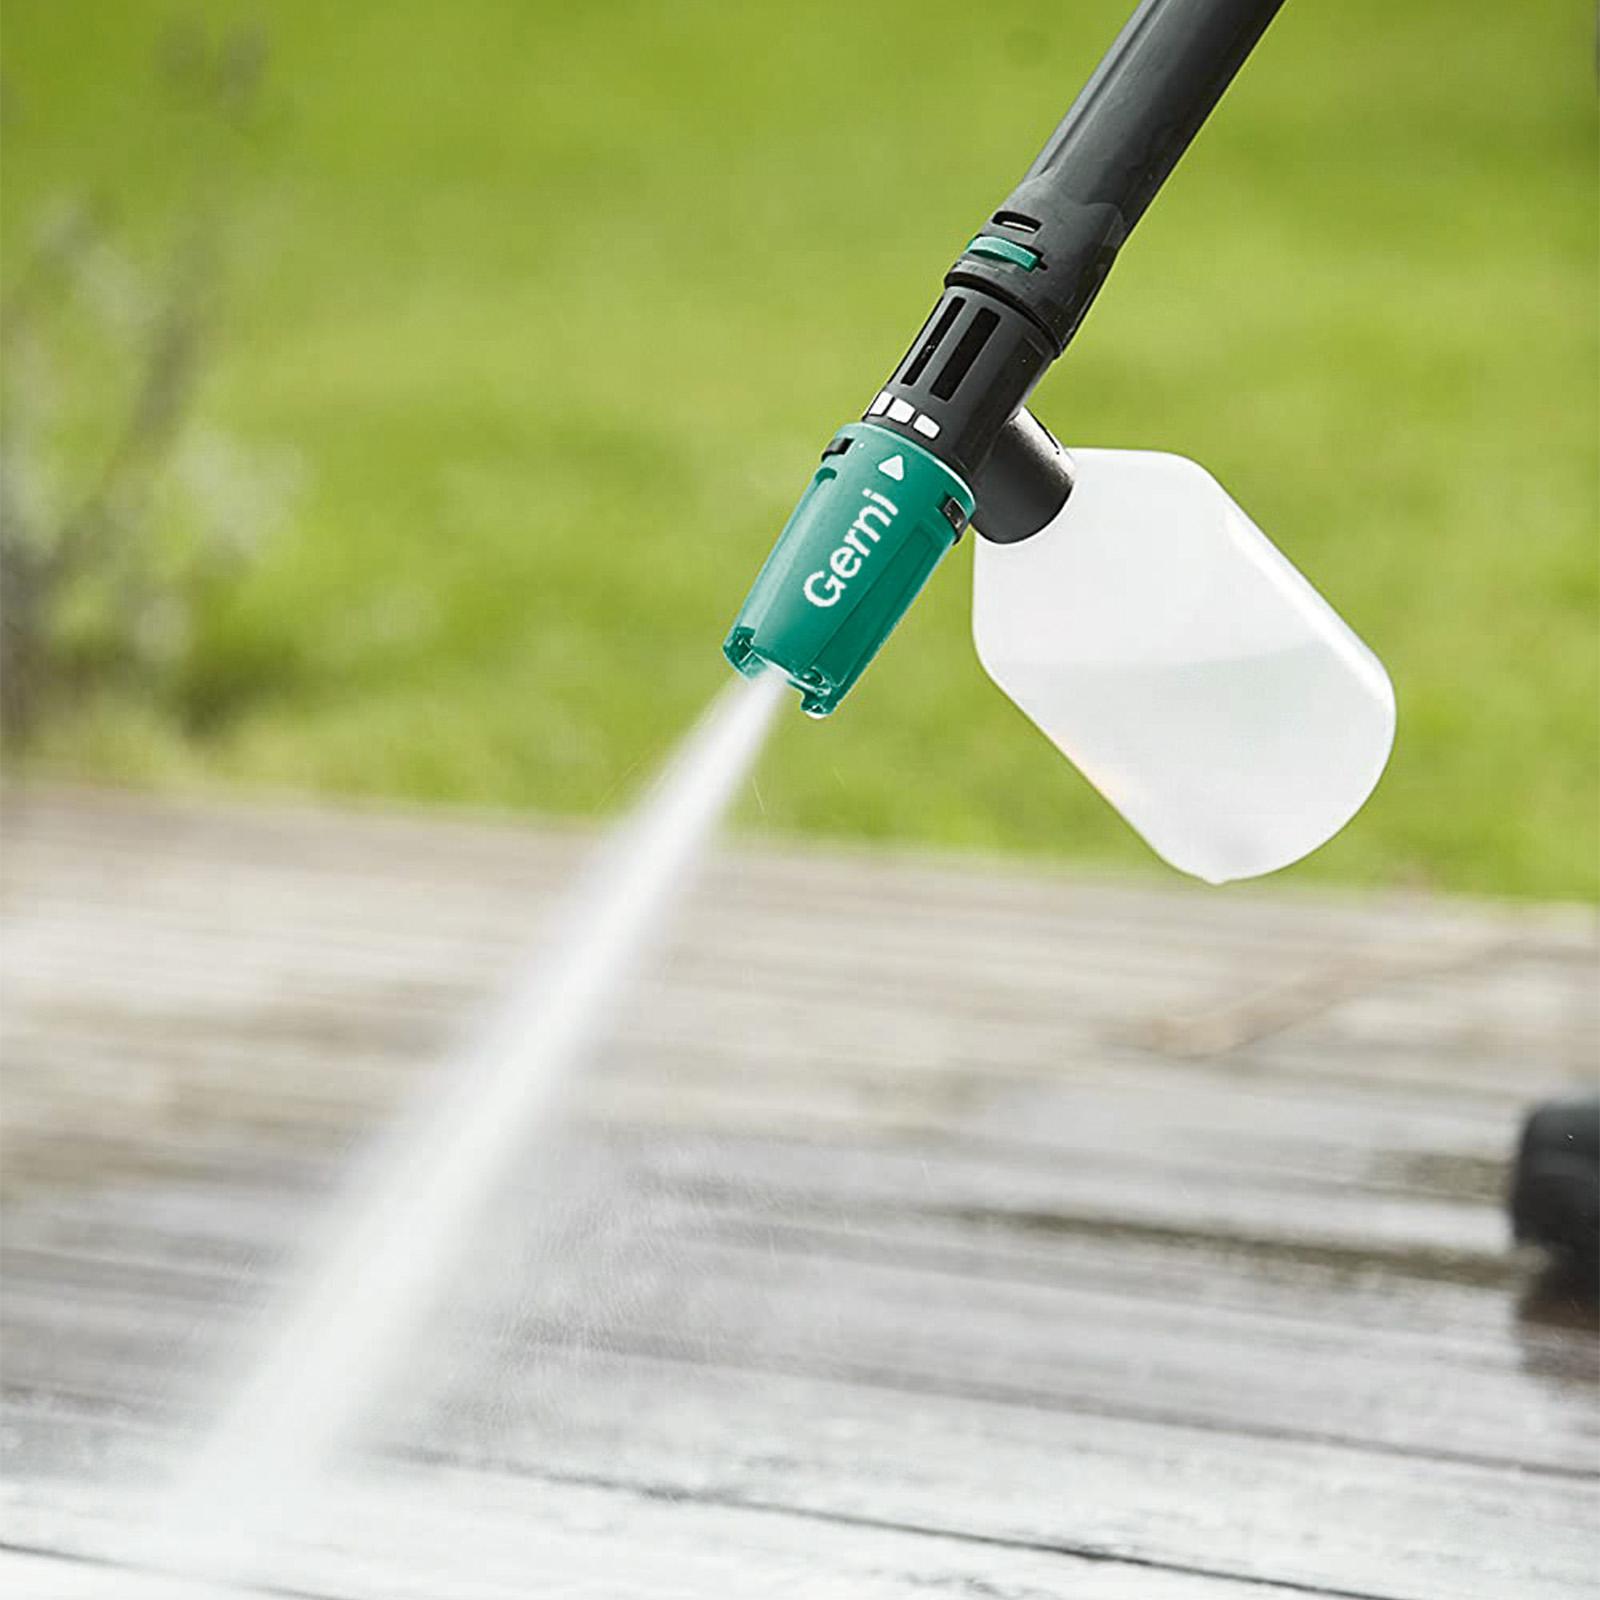 Gerni Super Foam Sprayer - Adjustable